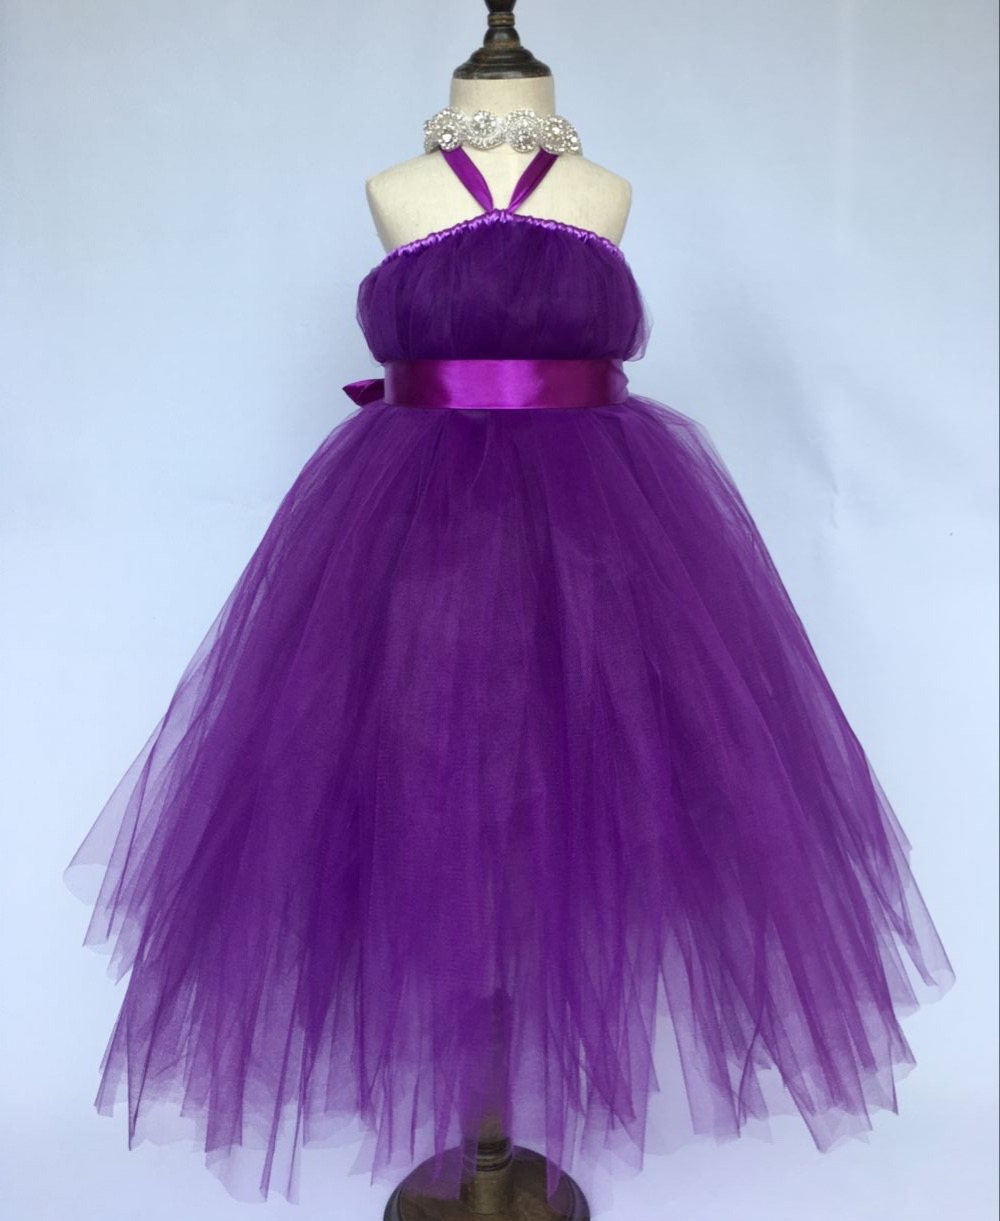 Hot Girls Purple Long Tutu Dress Kids Fluffy Vintage Dress Ball Gown with Ribbon Bow and Headband Children Party Princess Dress